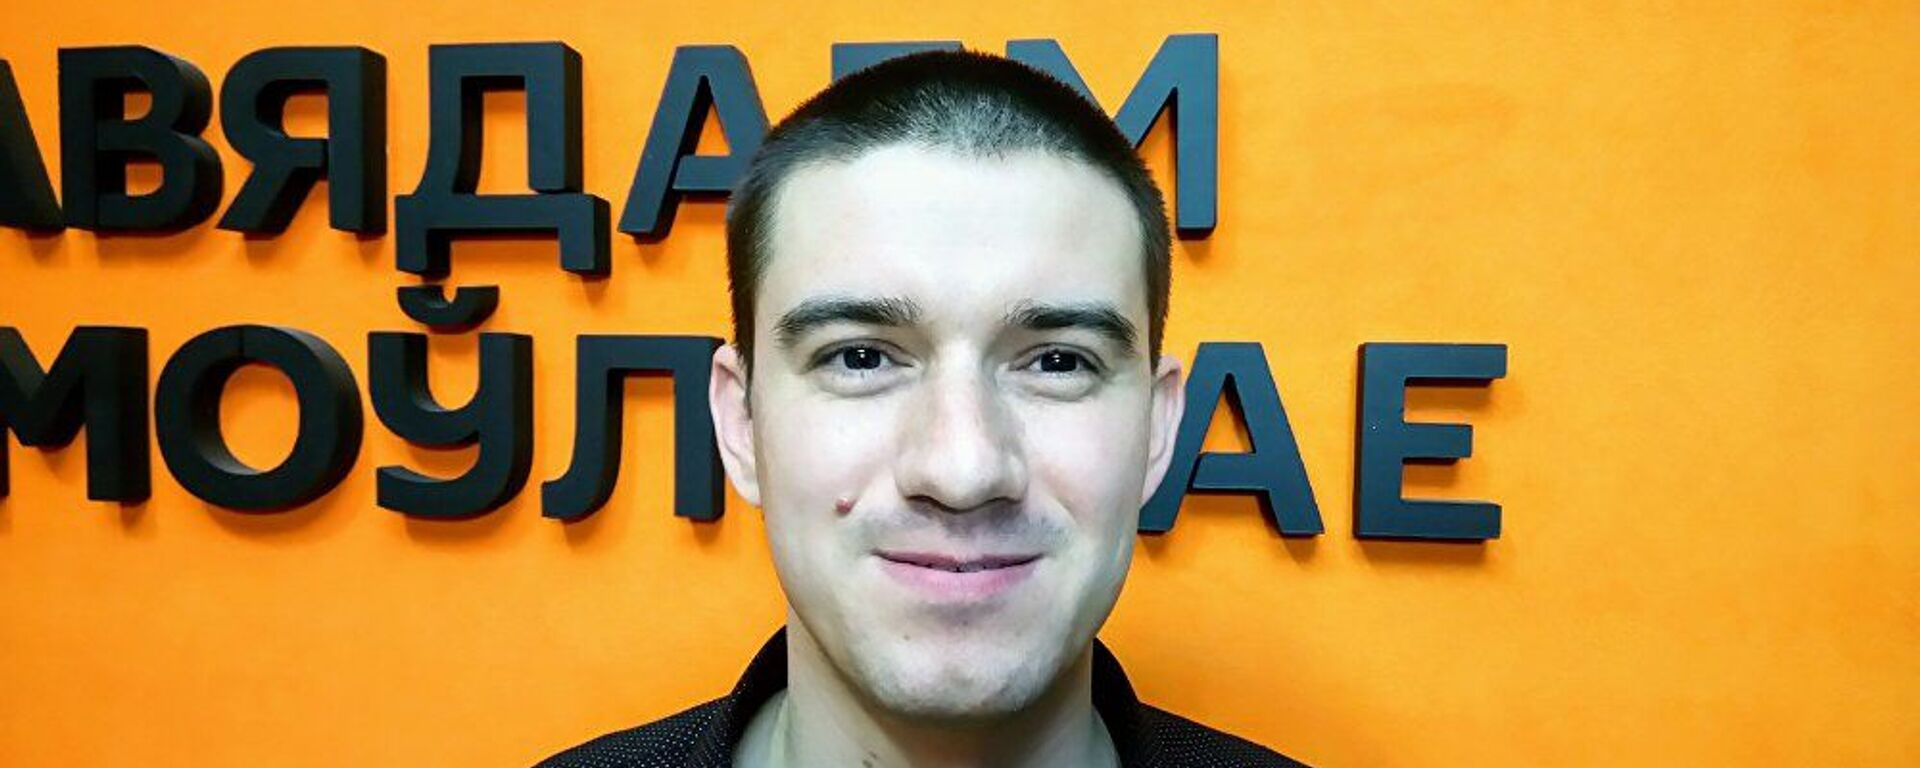 Глава аналитического бюро СОНАР-2050 Иван Лизан - Sputnik Латвия, 1920, 22.02.2021